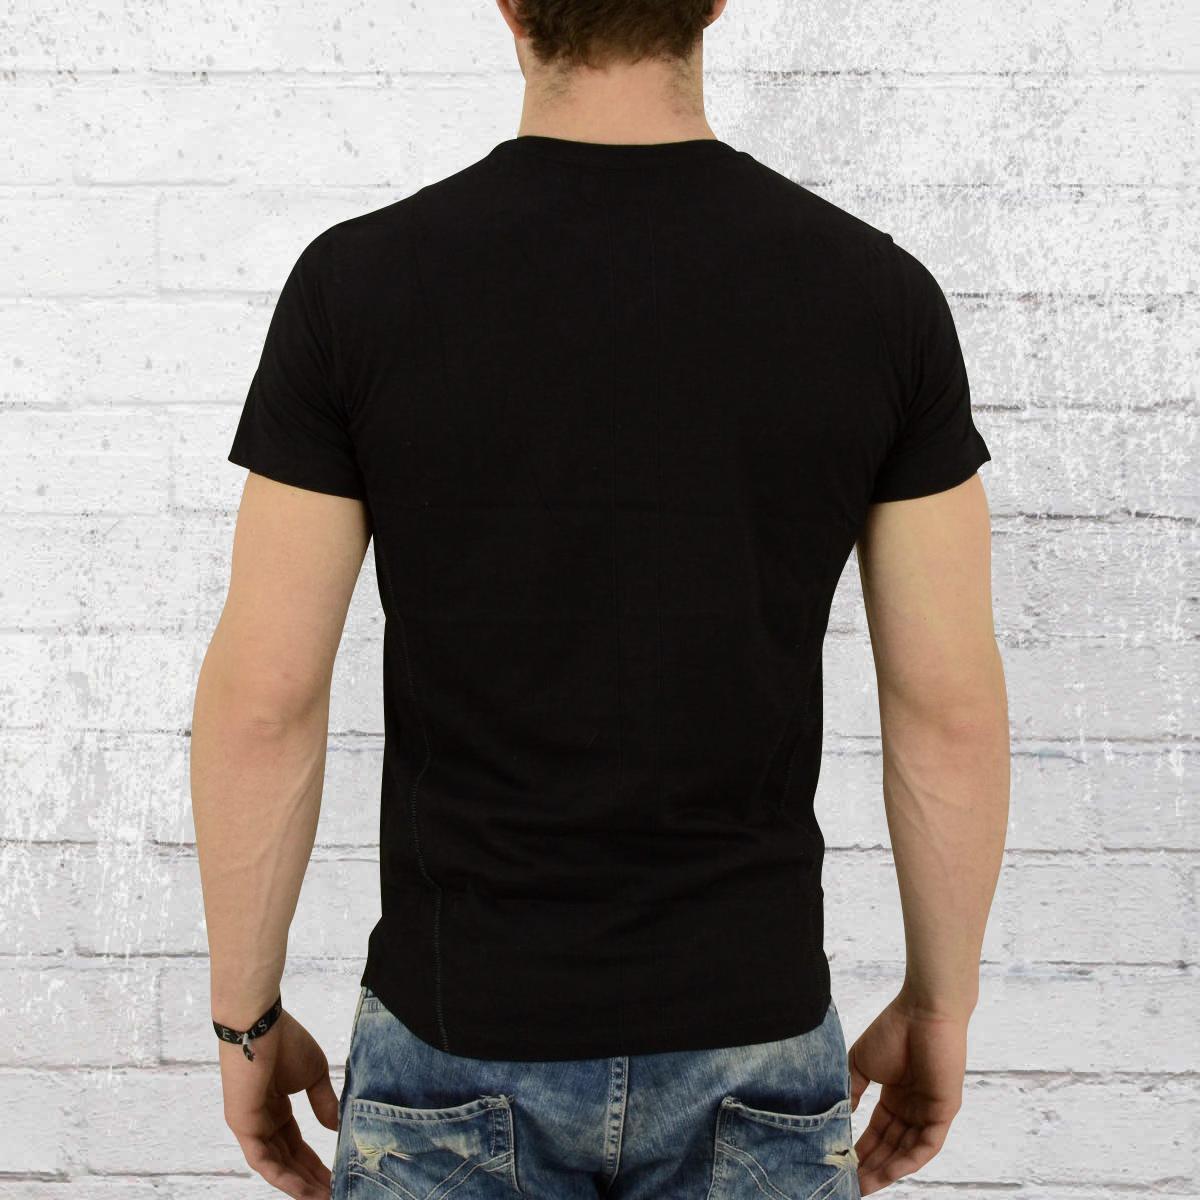 jetzt bestellen religion clothing t shirt m nner chain. Black Bedroom Furniture Sets. Home Design Ideas